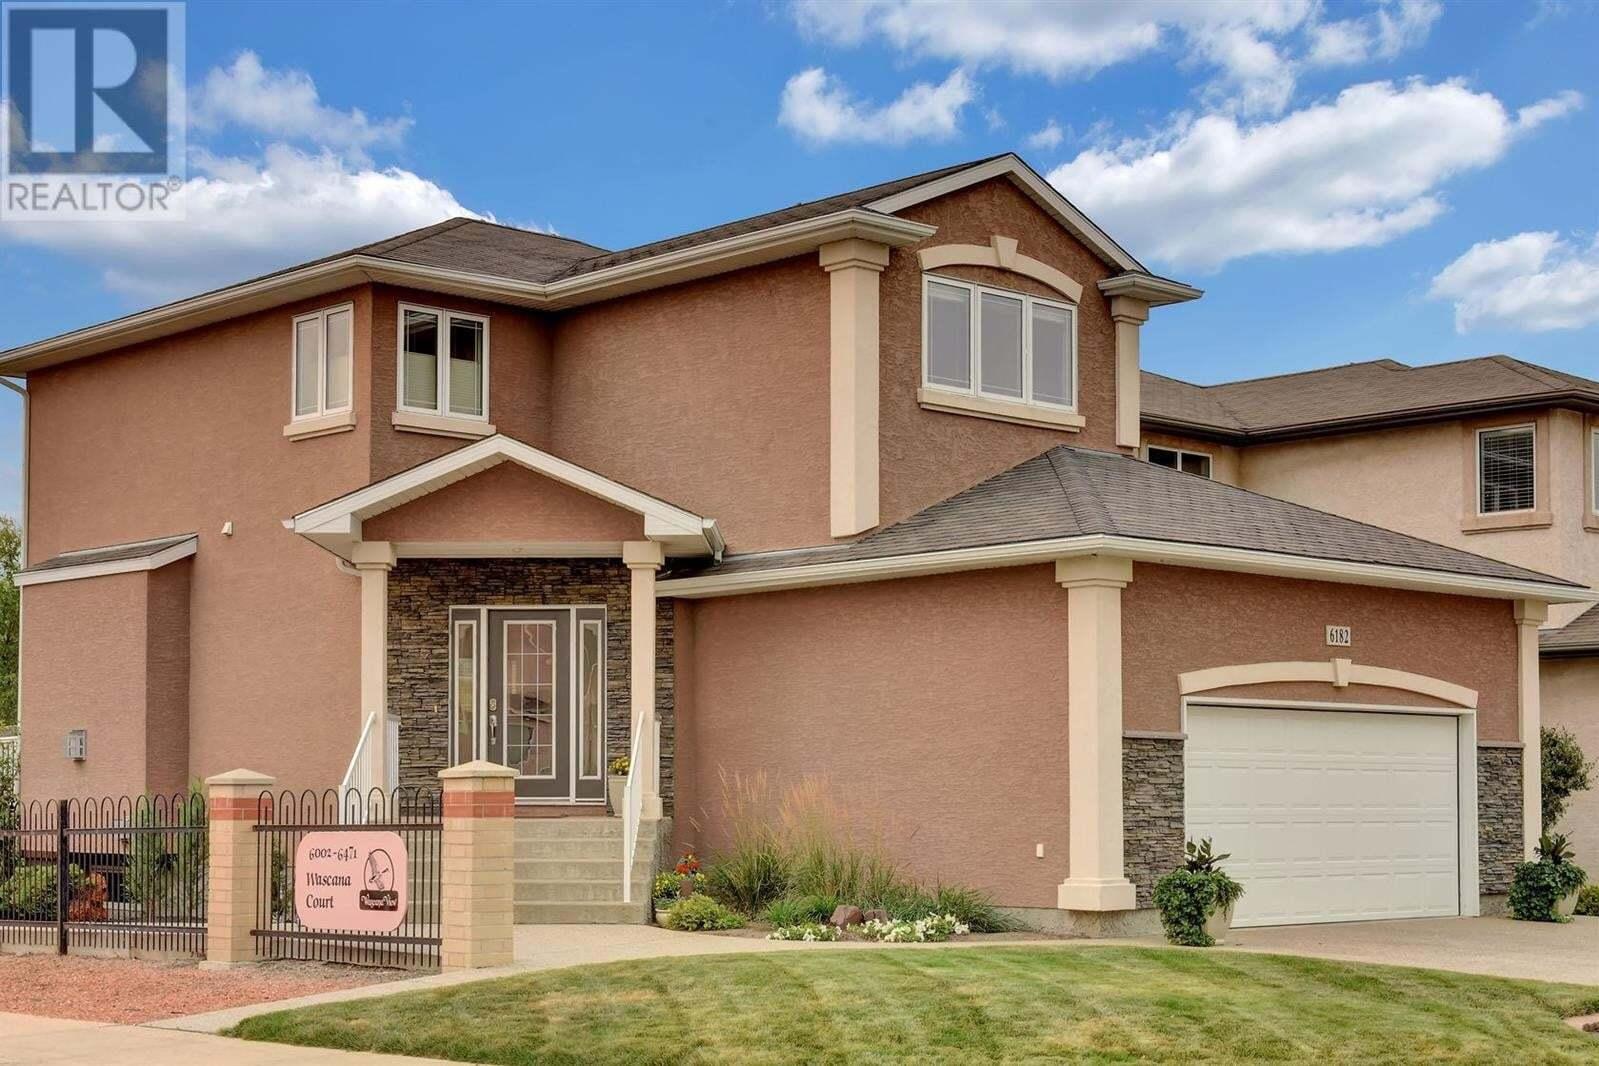 House for sale at 6182 Wascana Ct Regina Saskatchewan - MLS: SK826846